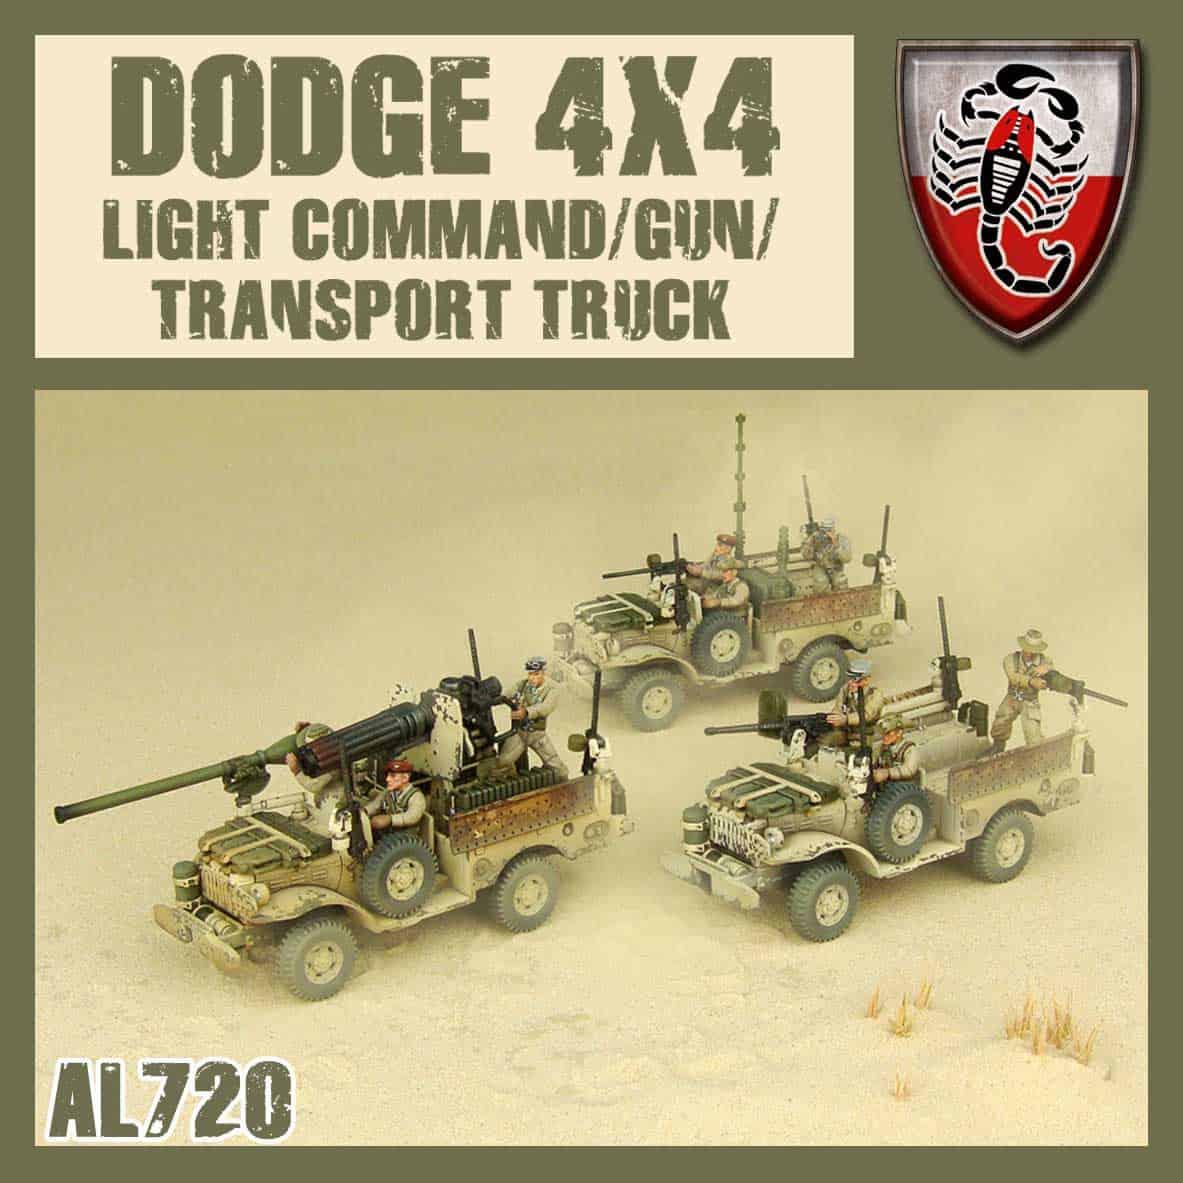 Zdjęcie Command/Gun/Transport Truck